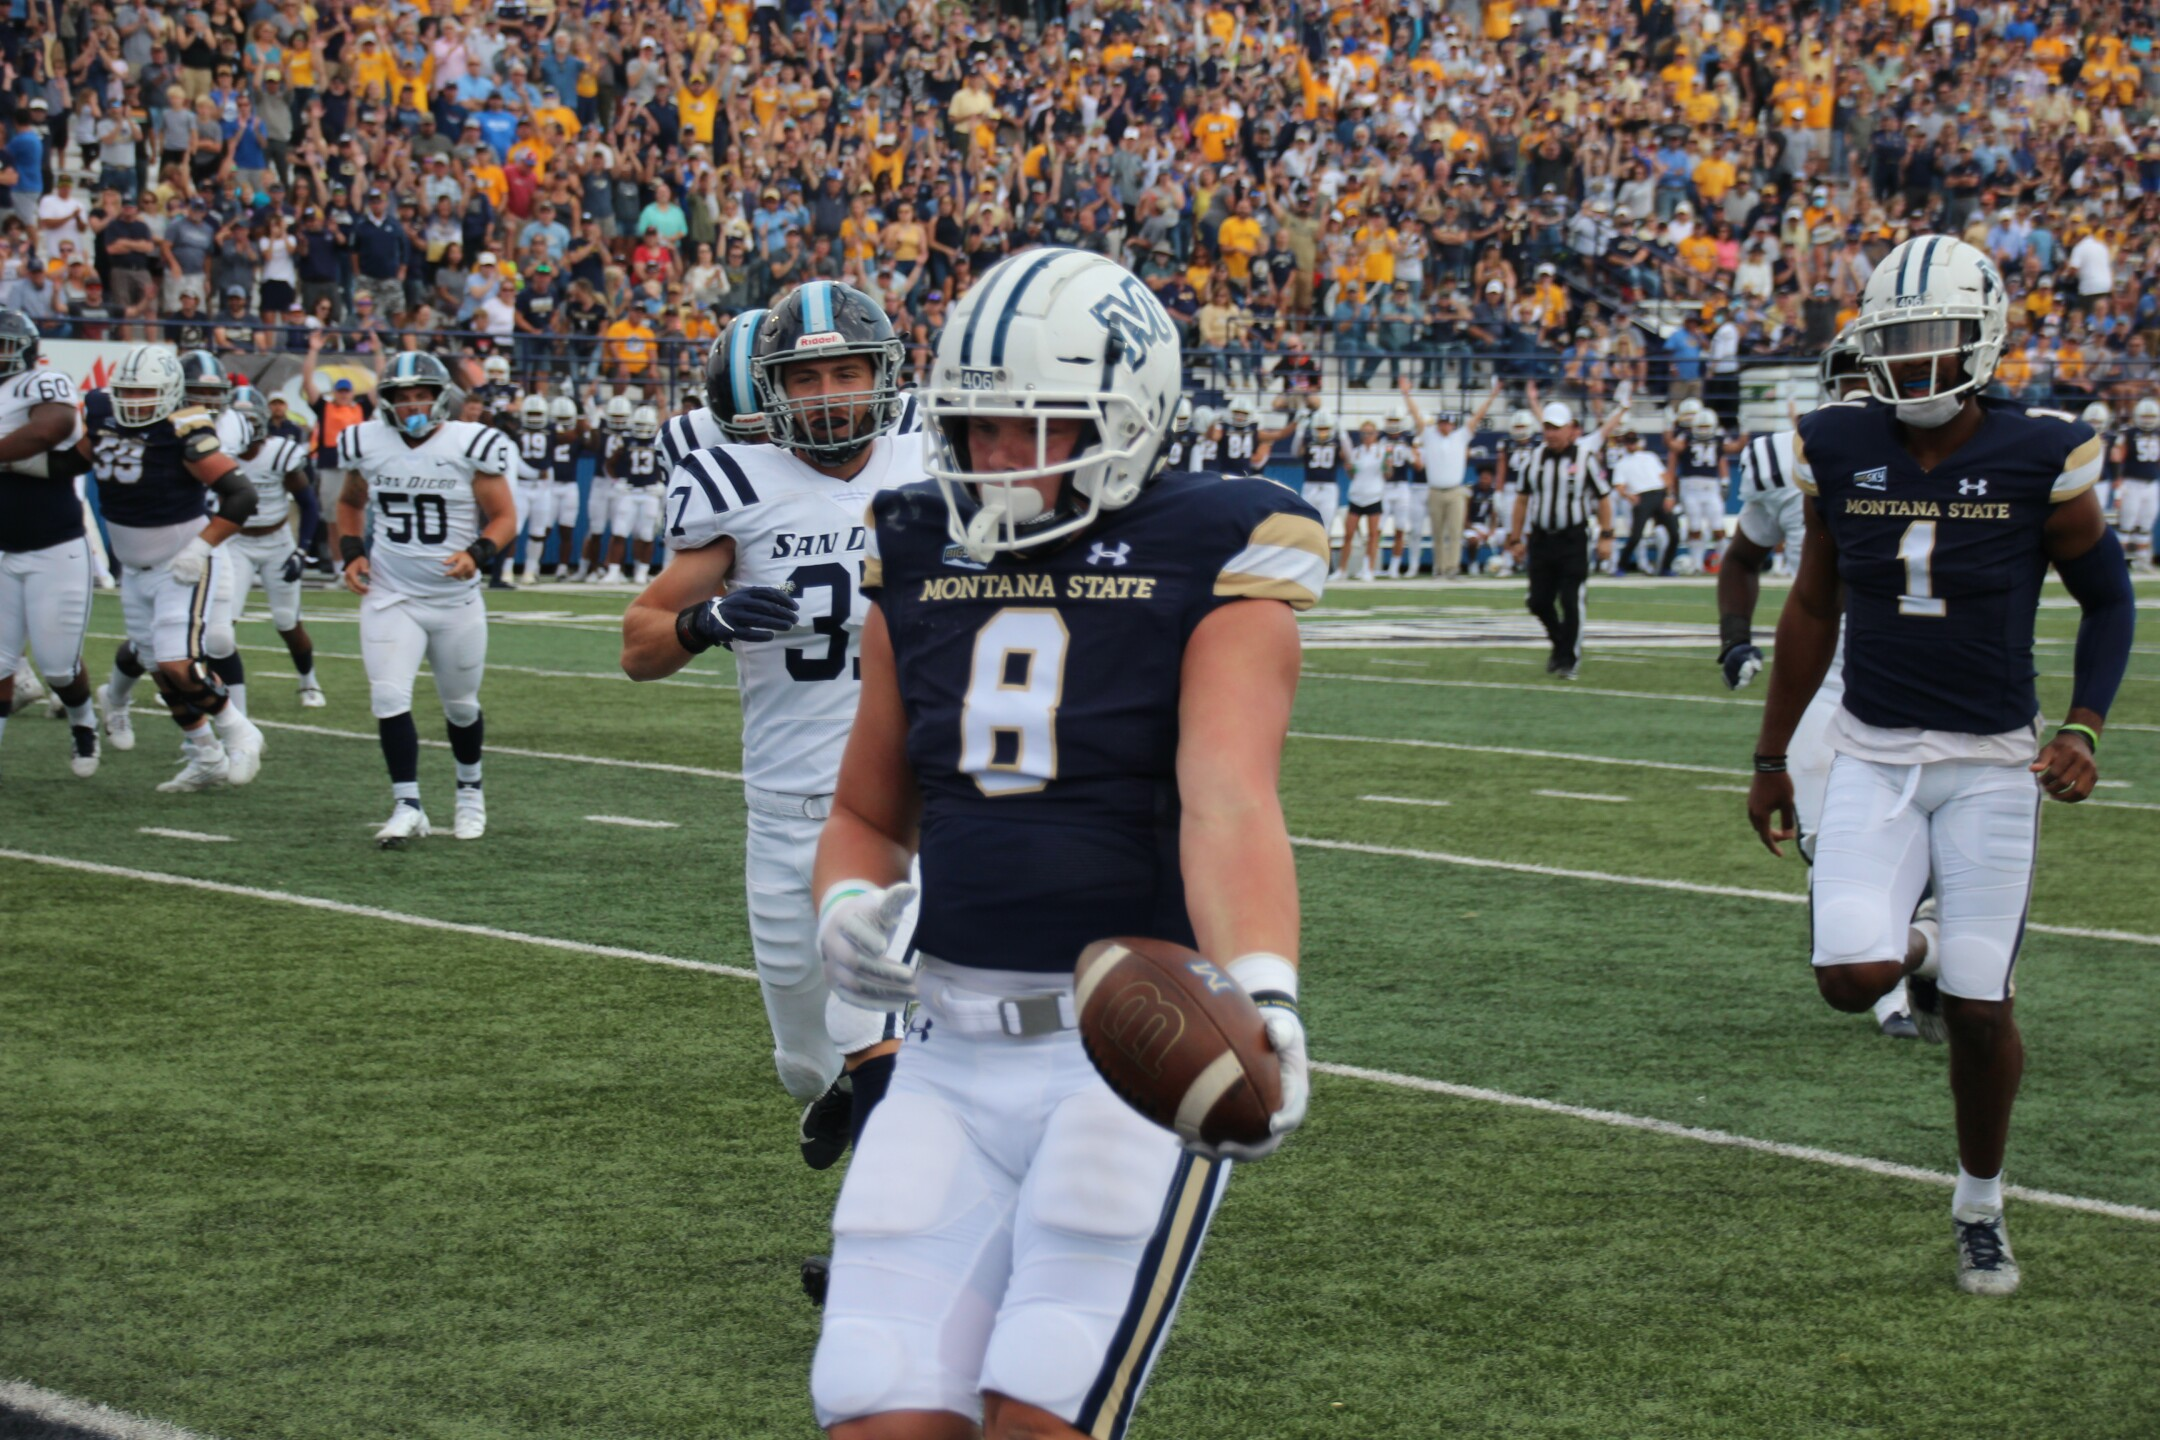 Tight End Derryk Snell celebrates a touchdown grab